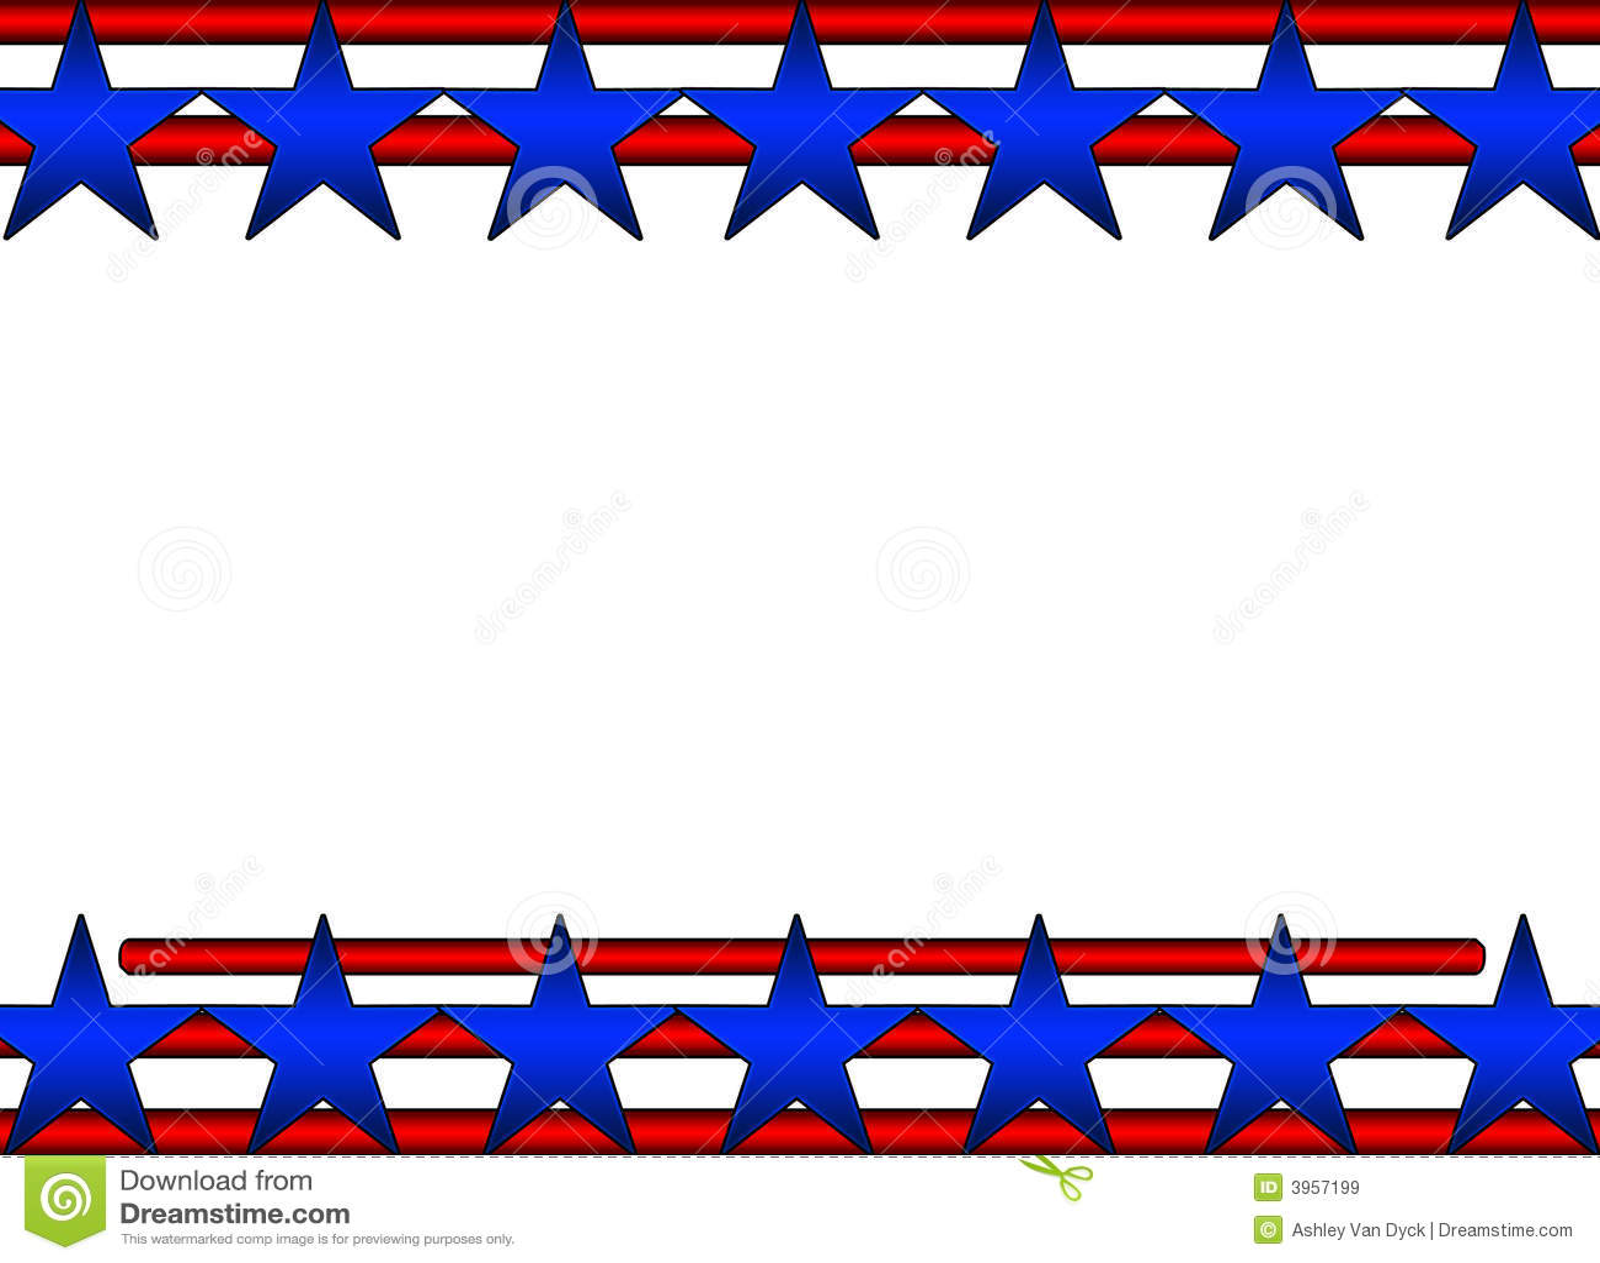 Clipart American Flag Border